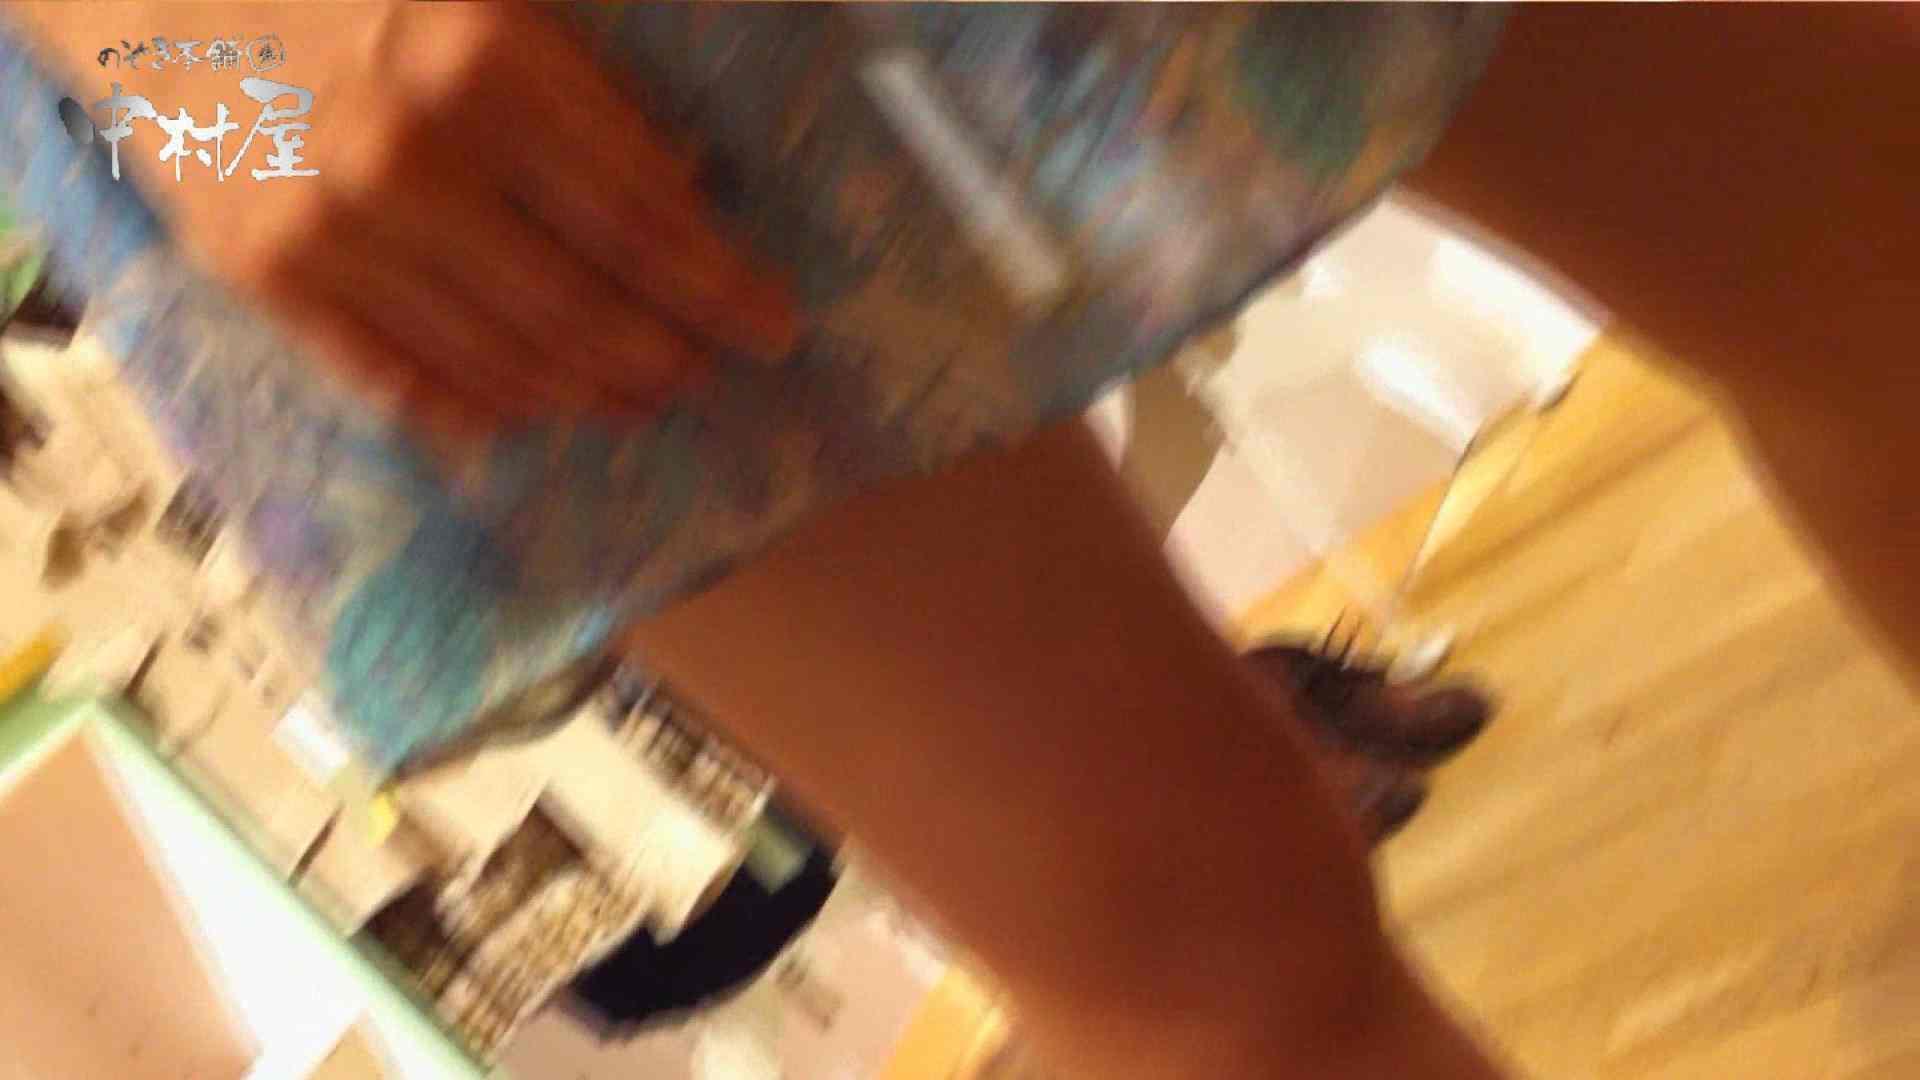 vol.43 可愛いカリスマ店員限定‼胸チラ&パンチラ 美脚おねーさんの胸元ゲット! 胸チラ  11枚 8